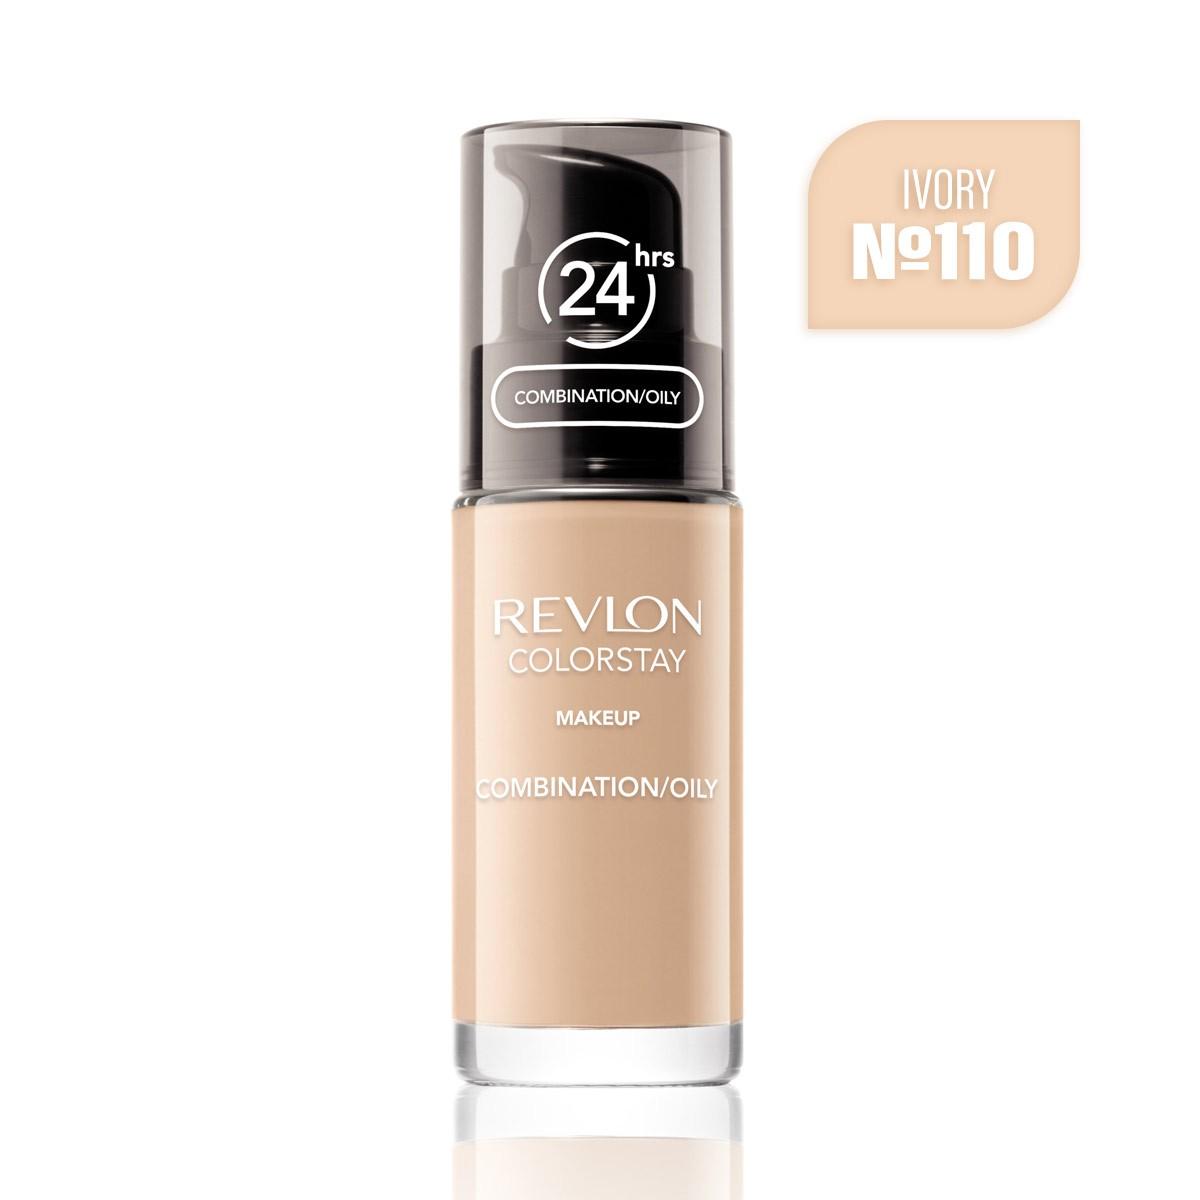 REVLON ColorStay Makeup OILY 110 Ivory 30ml - Podkład do cery tłustej i mieszanej